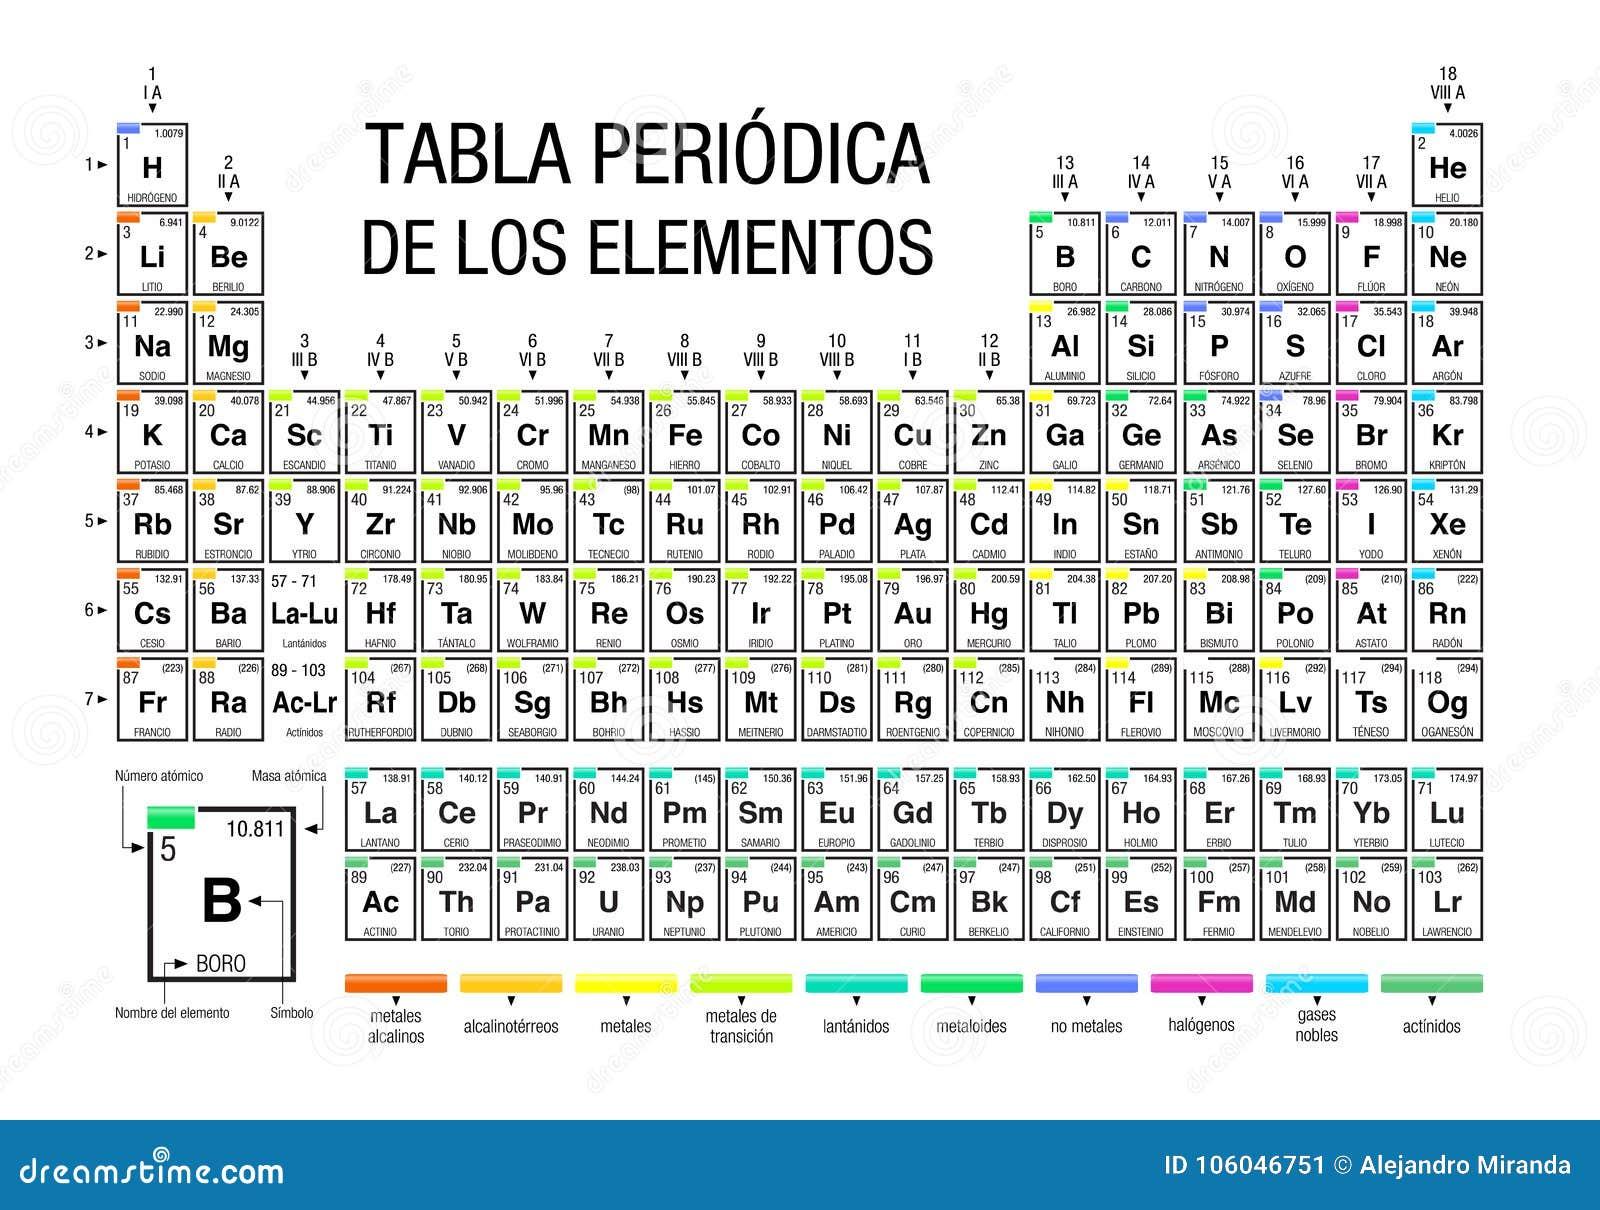 tabla periodica de los elementos periodic table of elements in spanish language on white